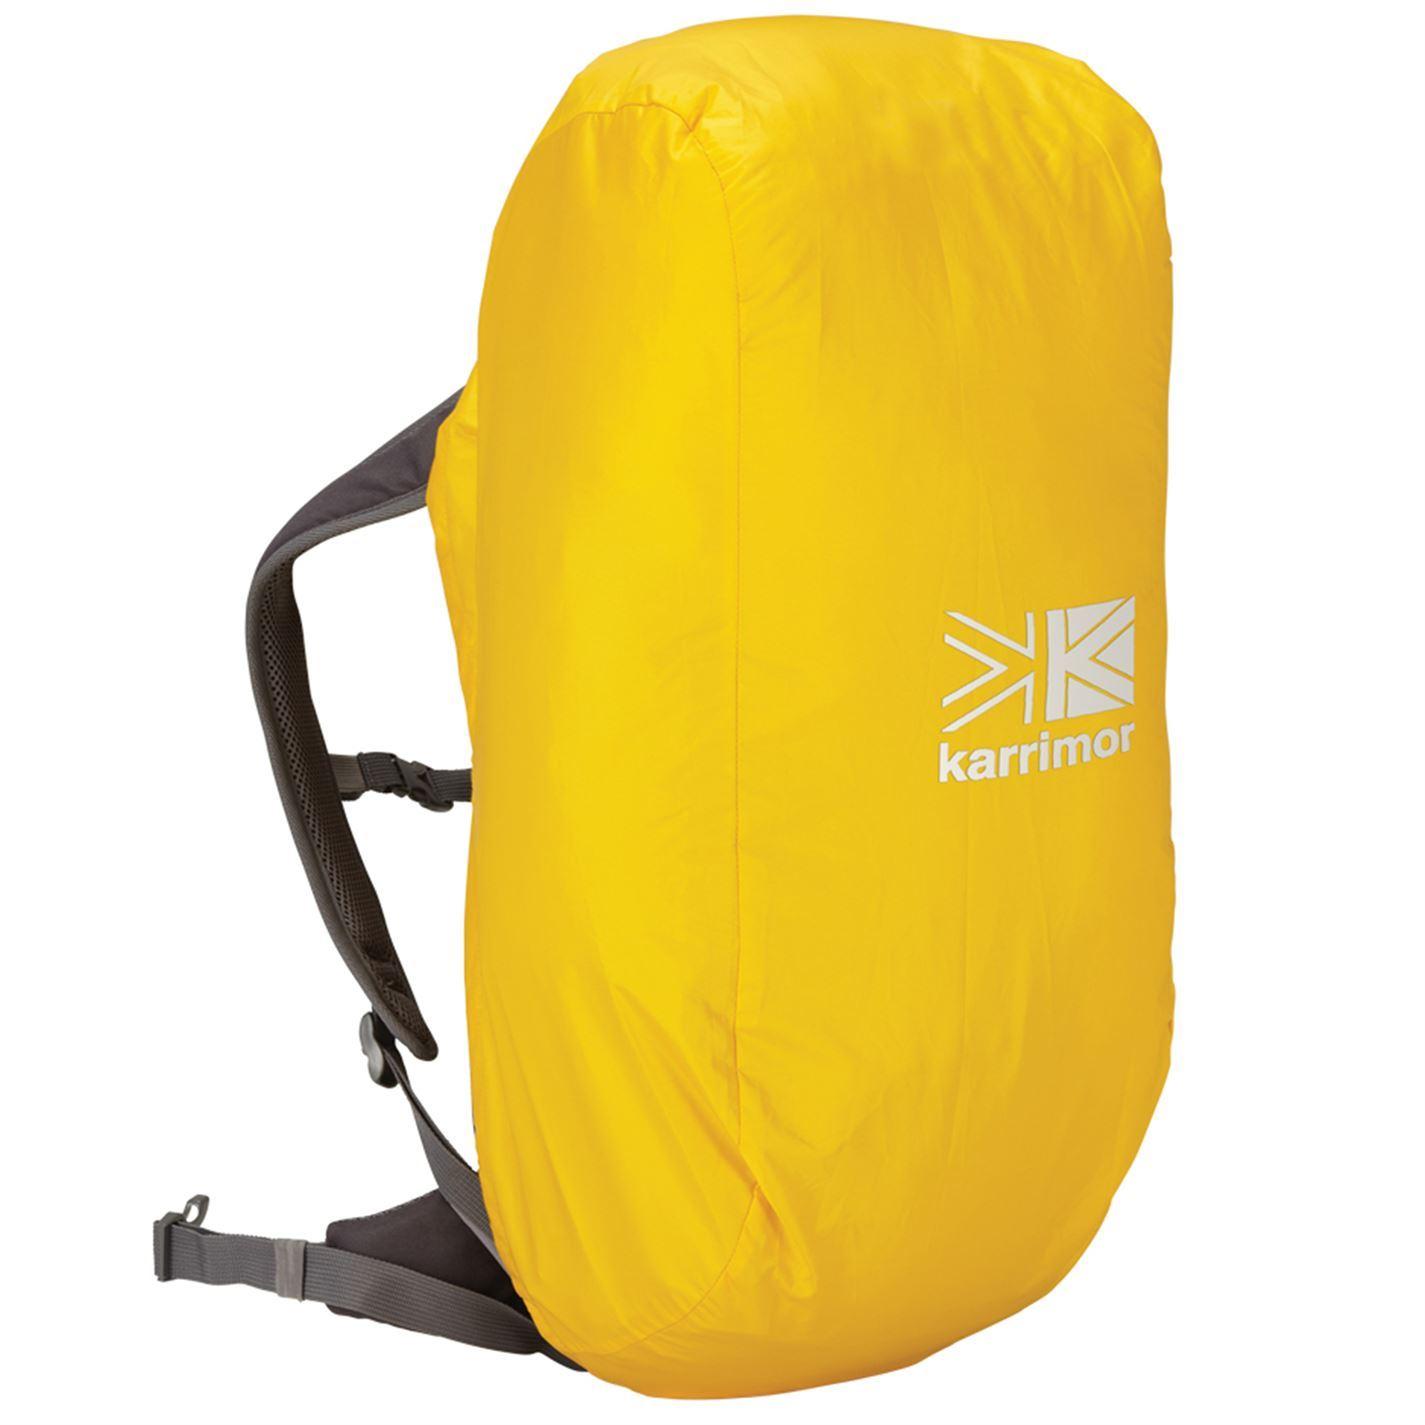 Karrimor Rucksack Rain Bag Cover Yellow Outdoors